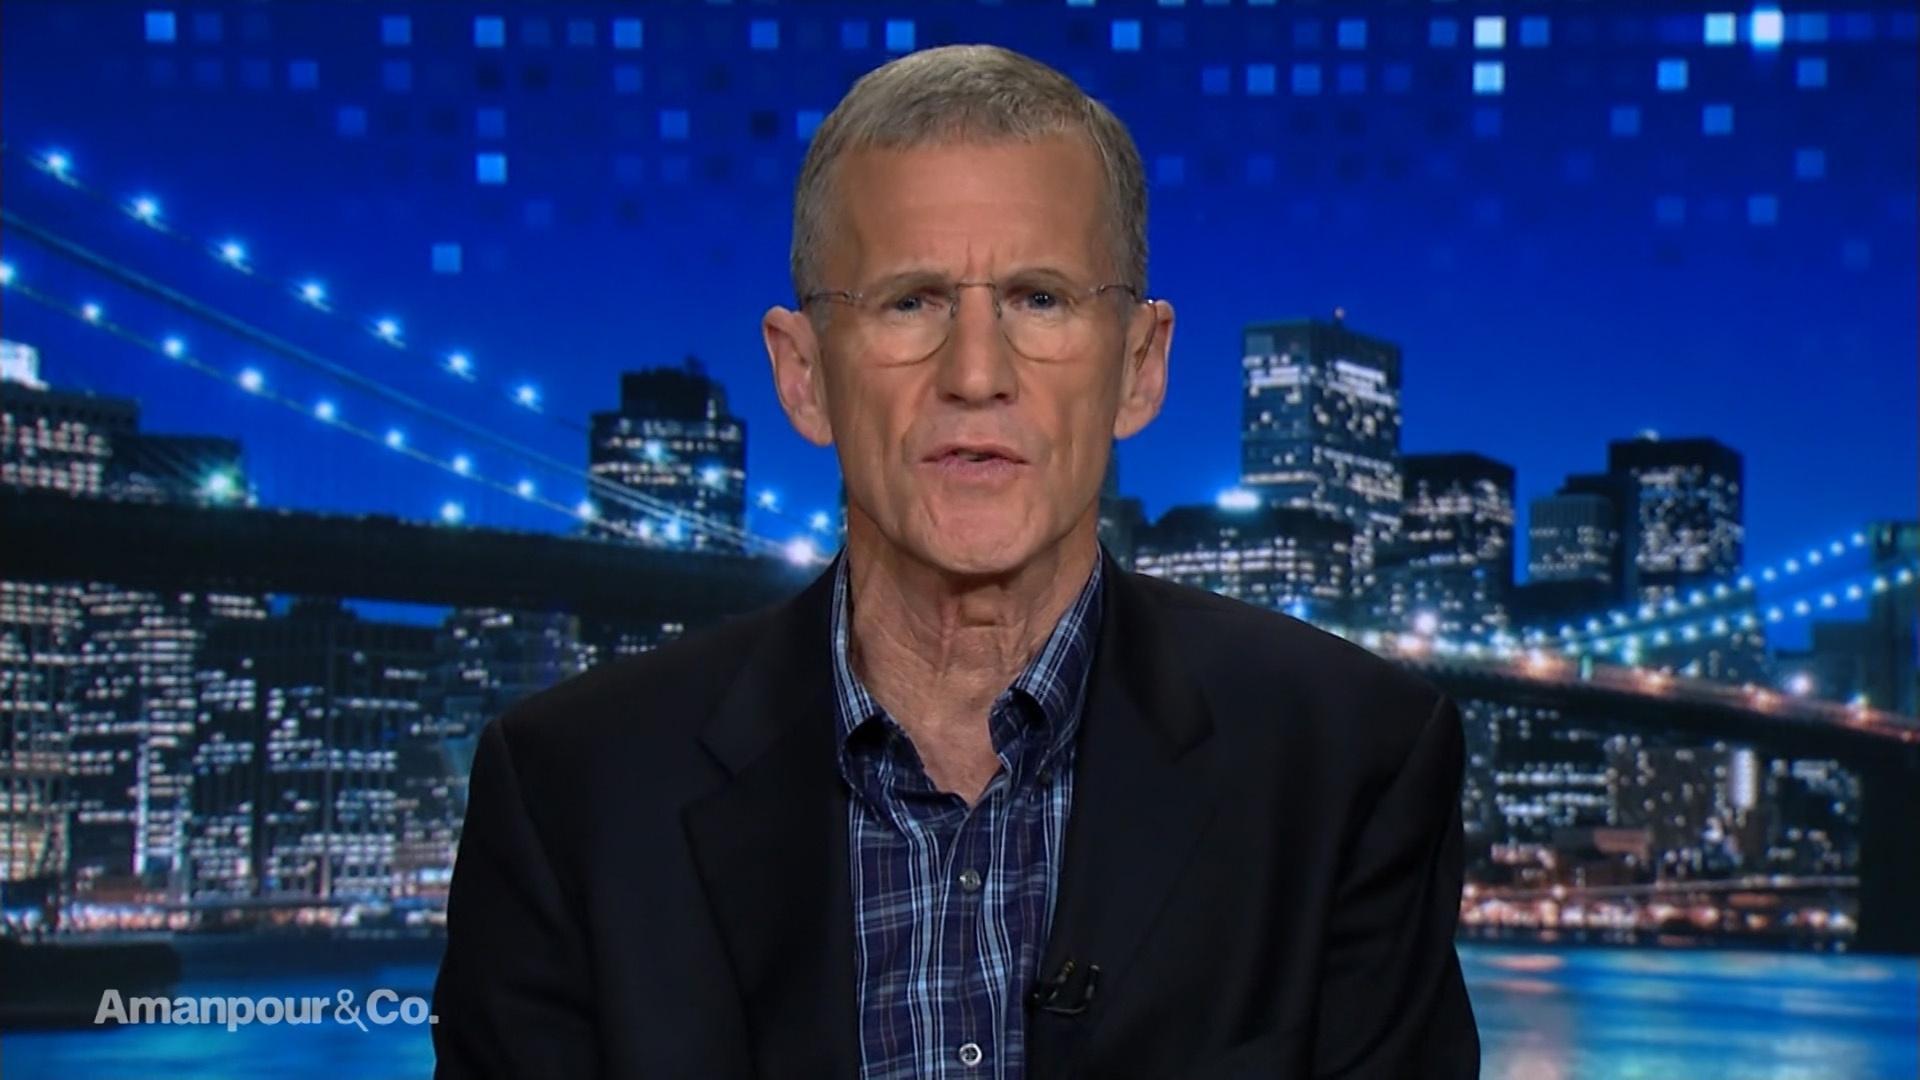 Stanley McChrystal on the United States' Longest War